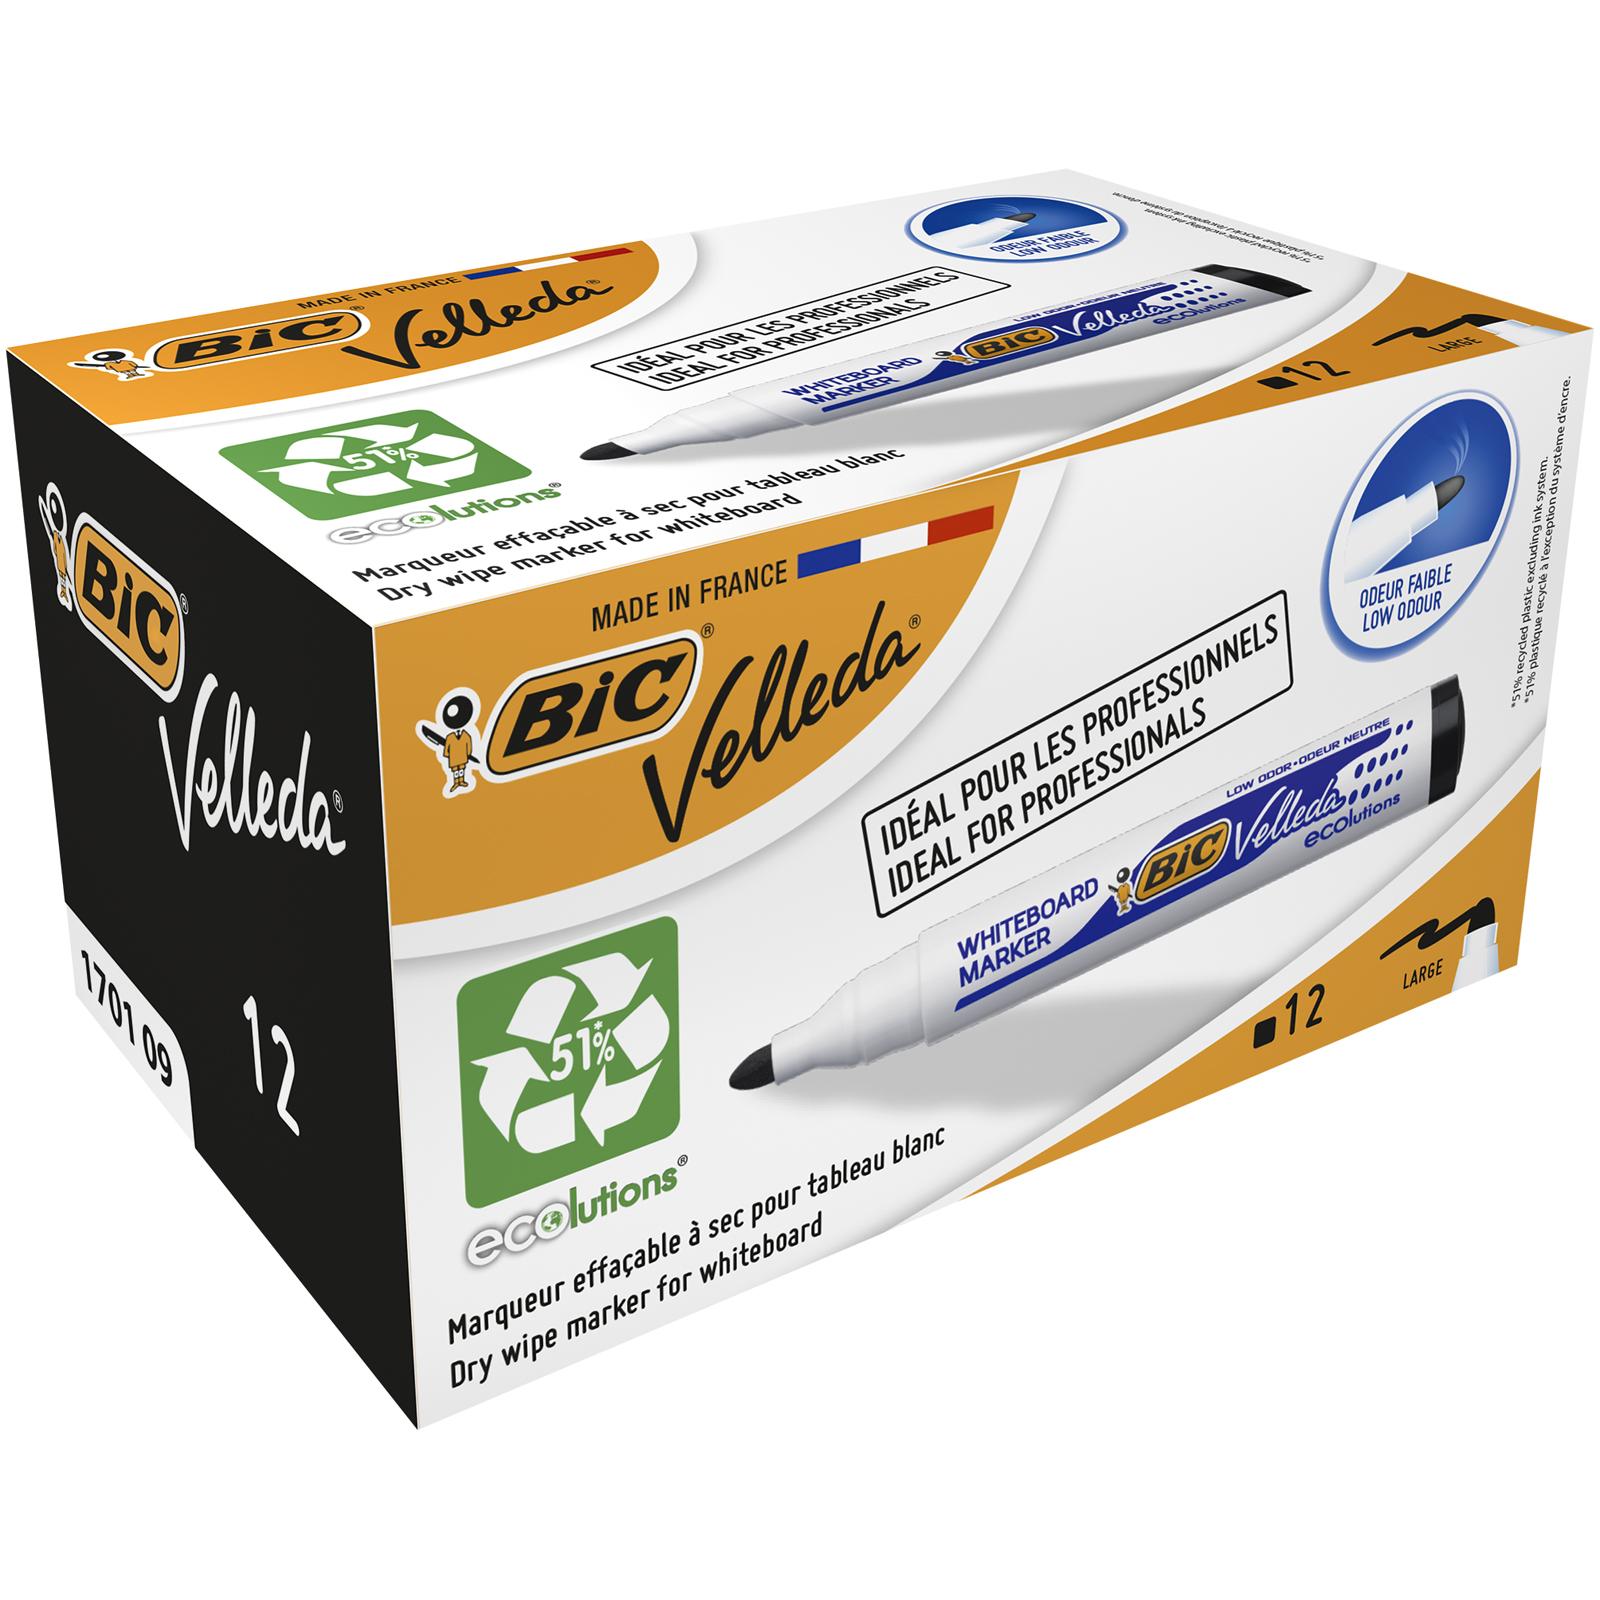 BIC VELLEDA 1701 - Pack de 12 - Marqueurs effaçables - pointe ogive - noir